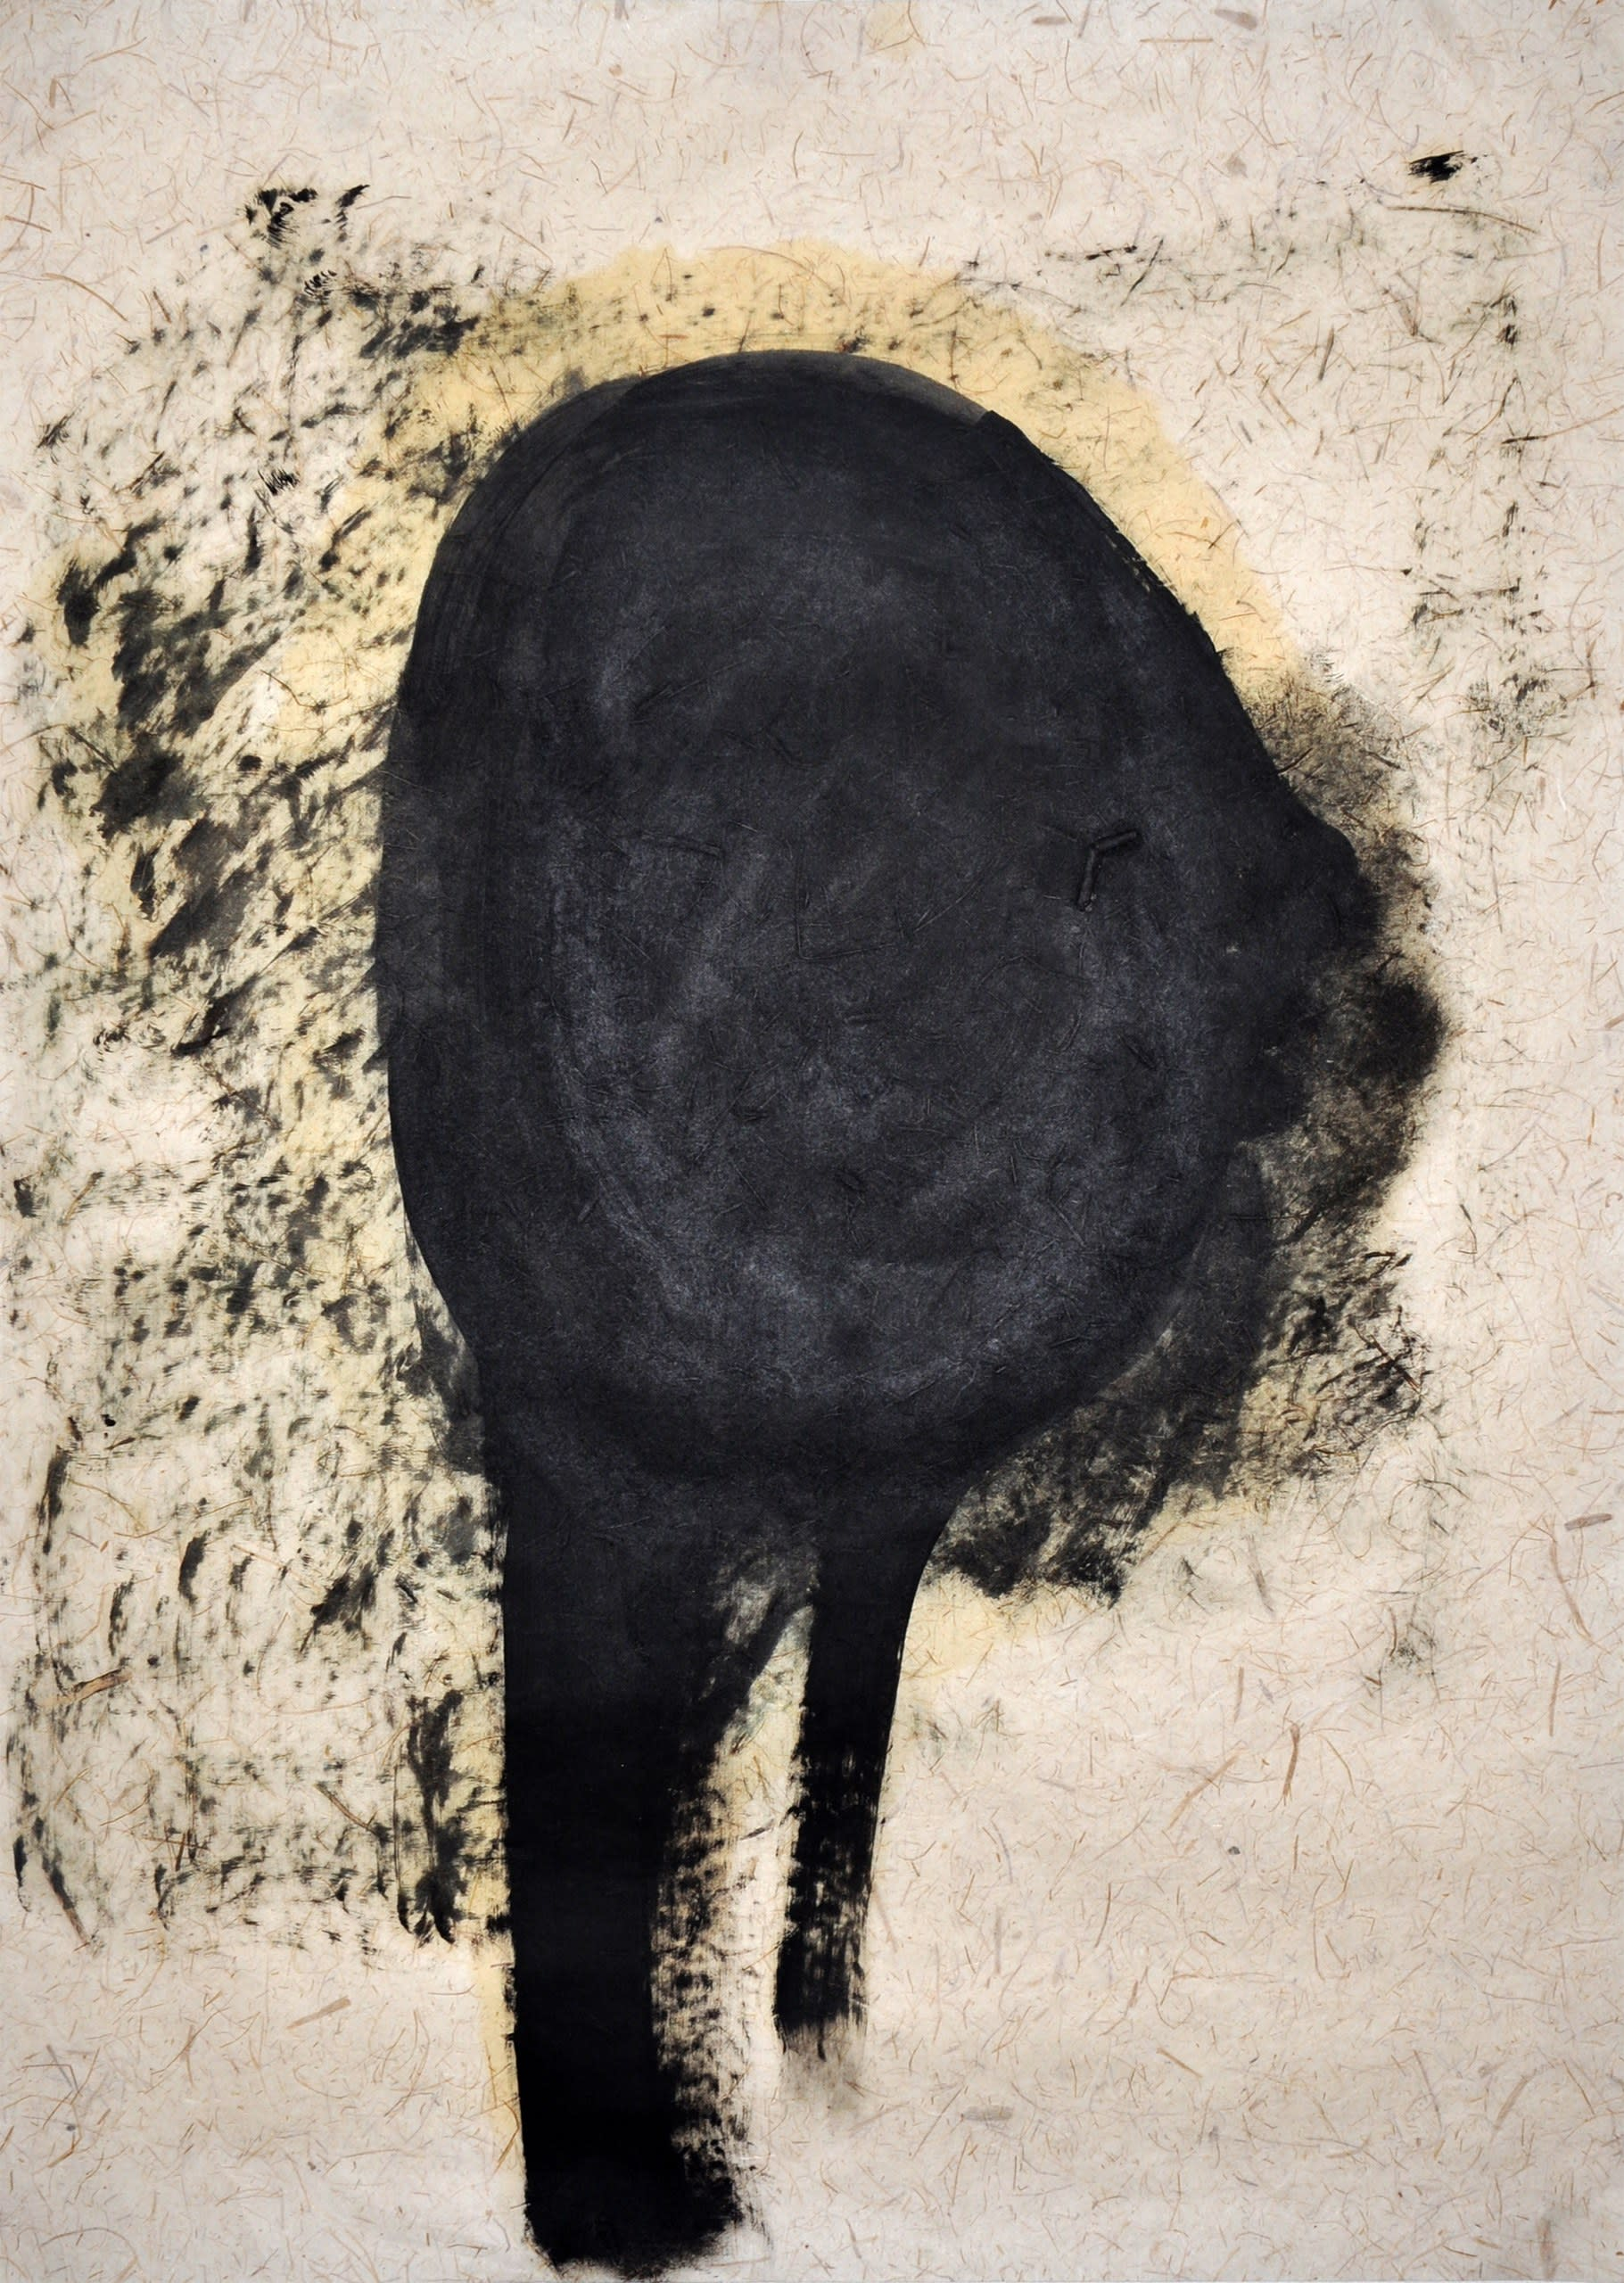 Untitled self- portrait 4 2020